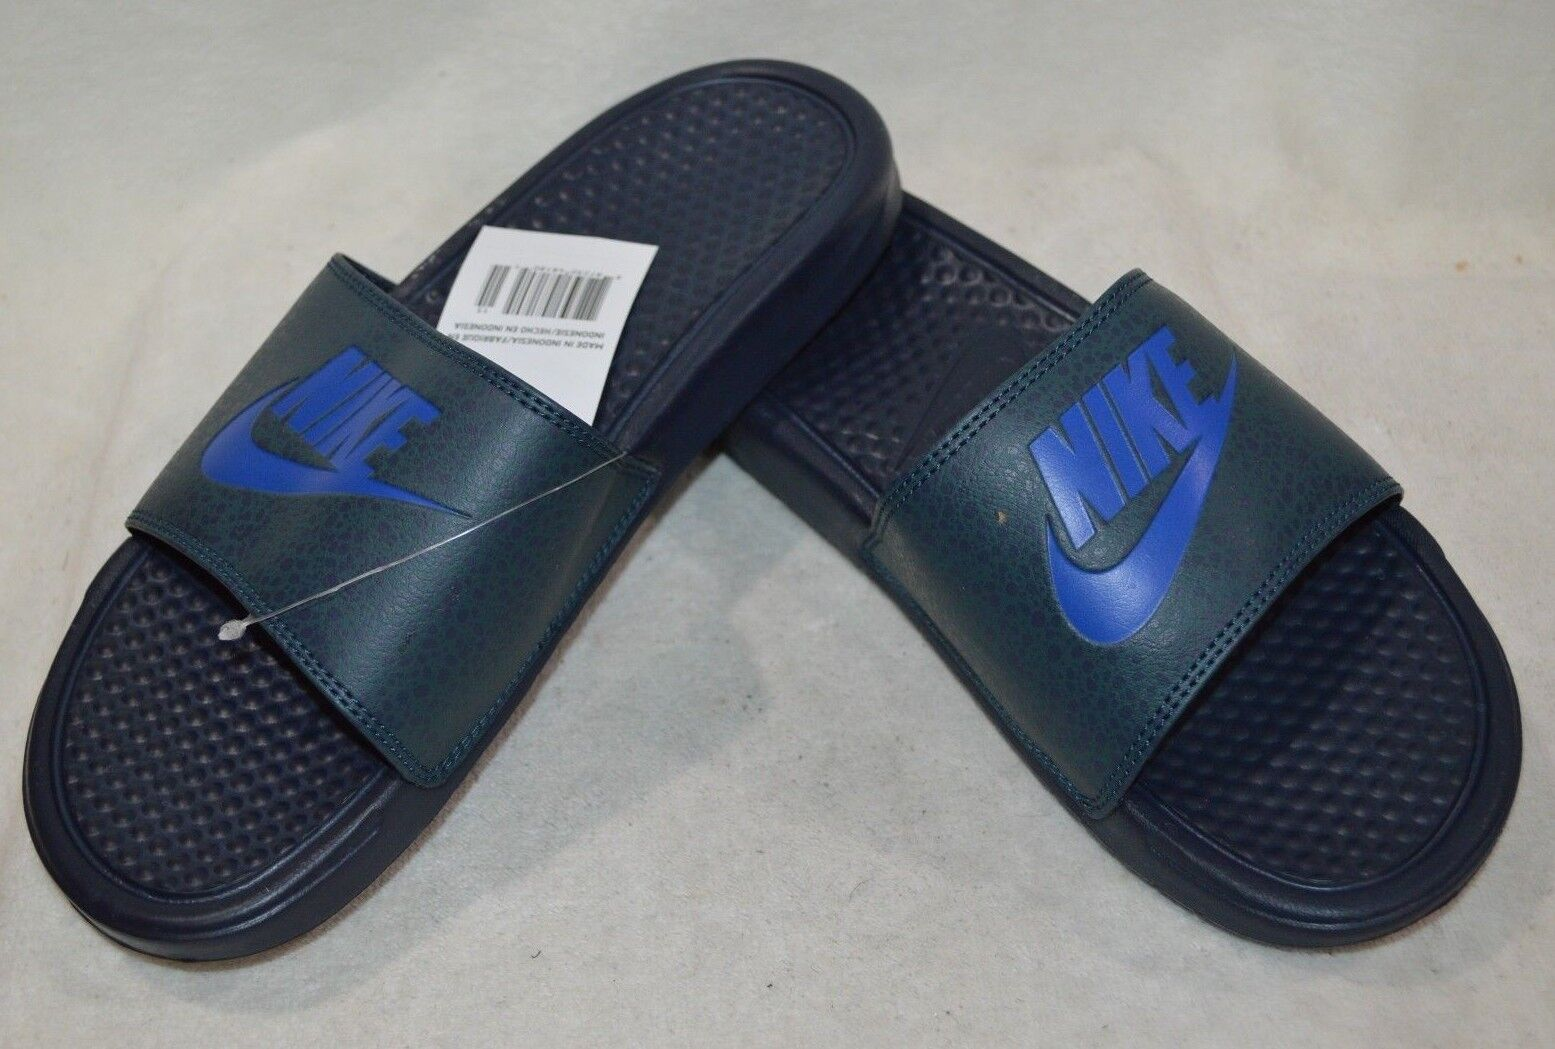 reputable site bbc78 0104b Nike Benassi JDI JDI JDI Print Obsidian R-Blue Men s Slides Sandals-8